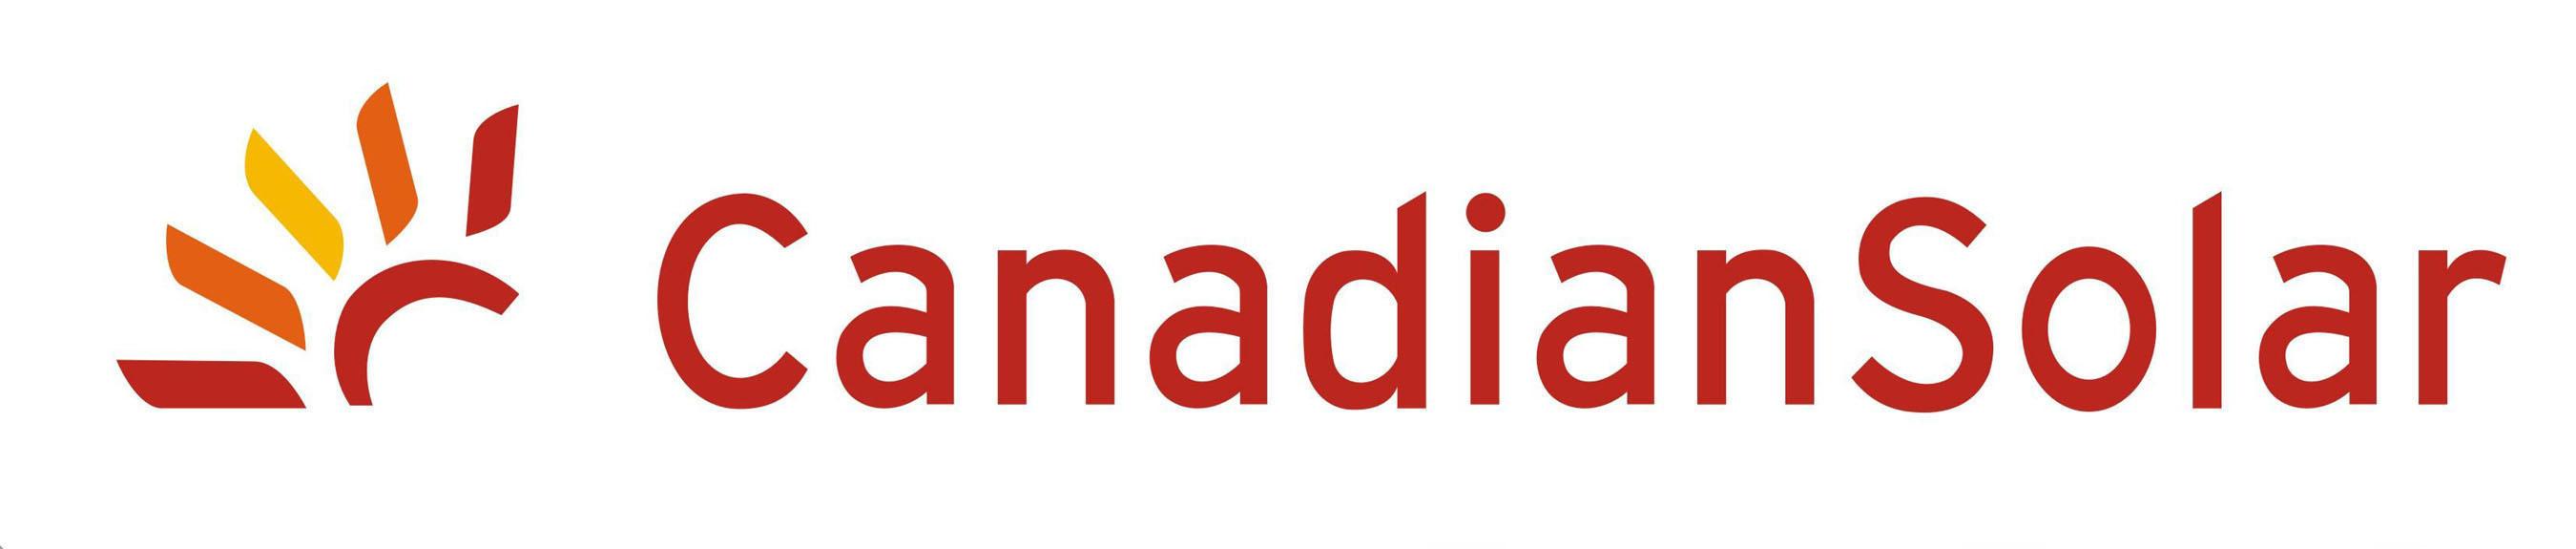 logo-3-canadiansolar